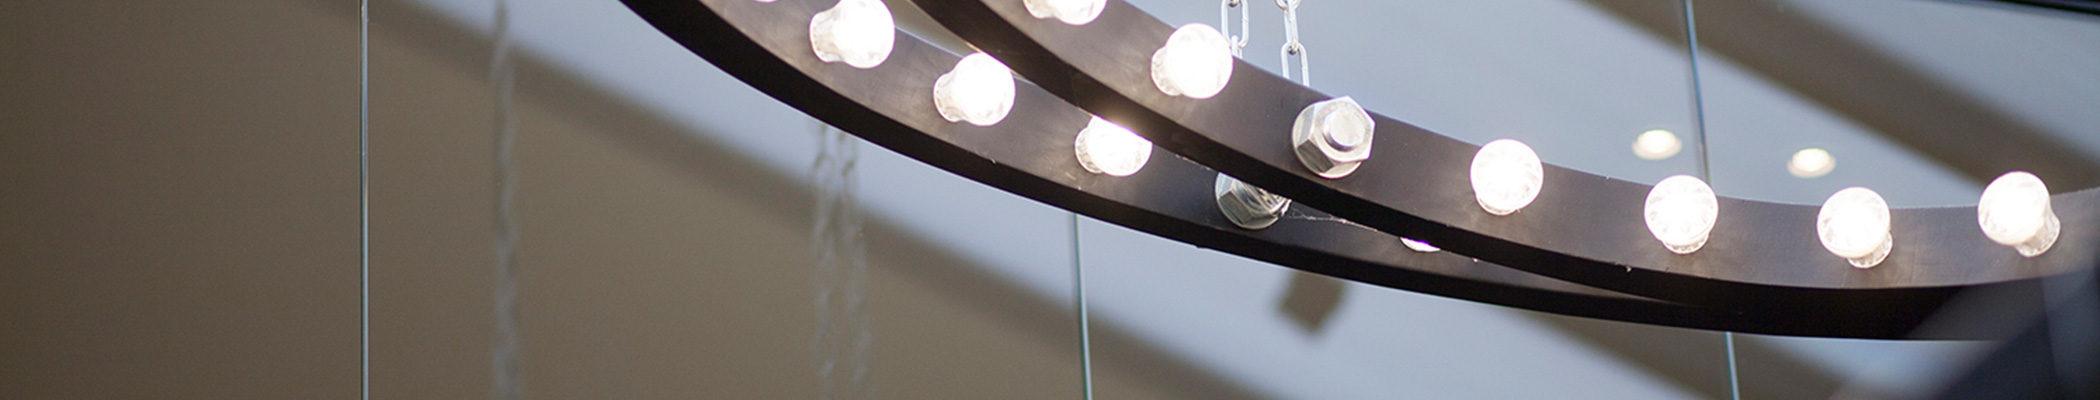 boutique-hotel-zaandam-manzo-lobby-detail-lamp